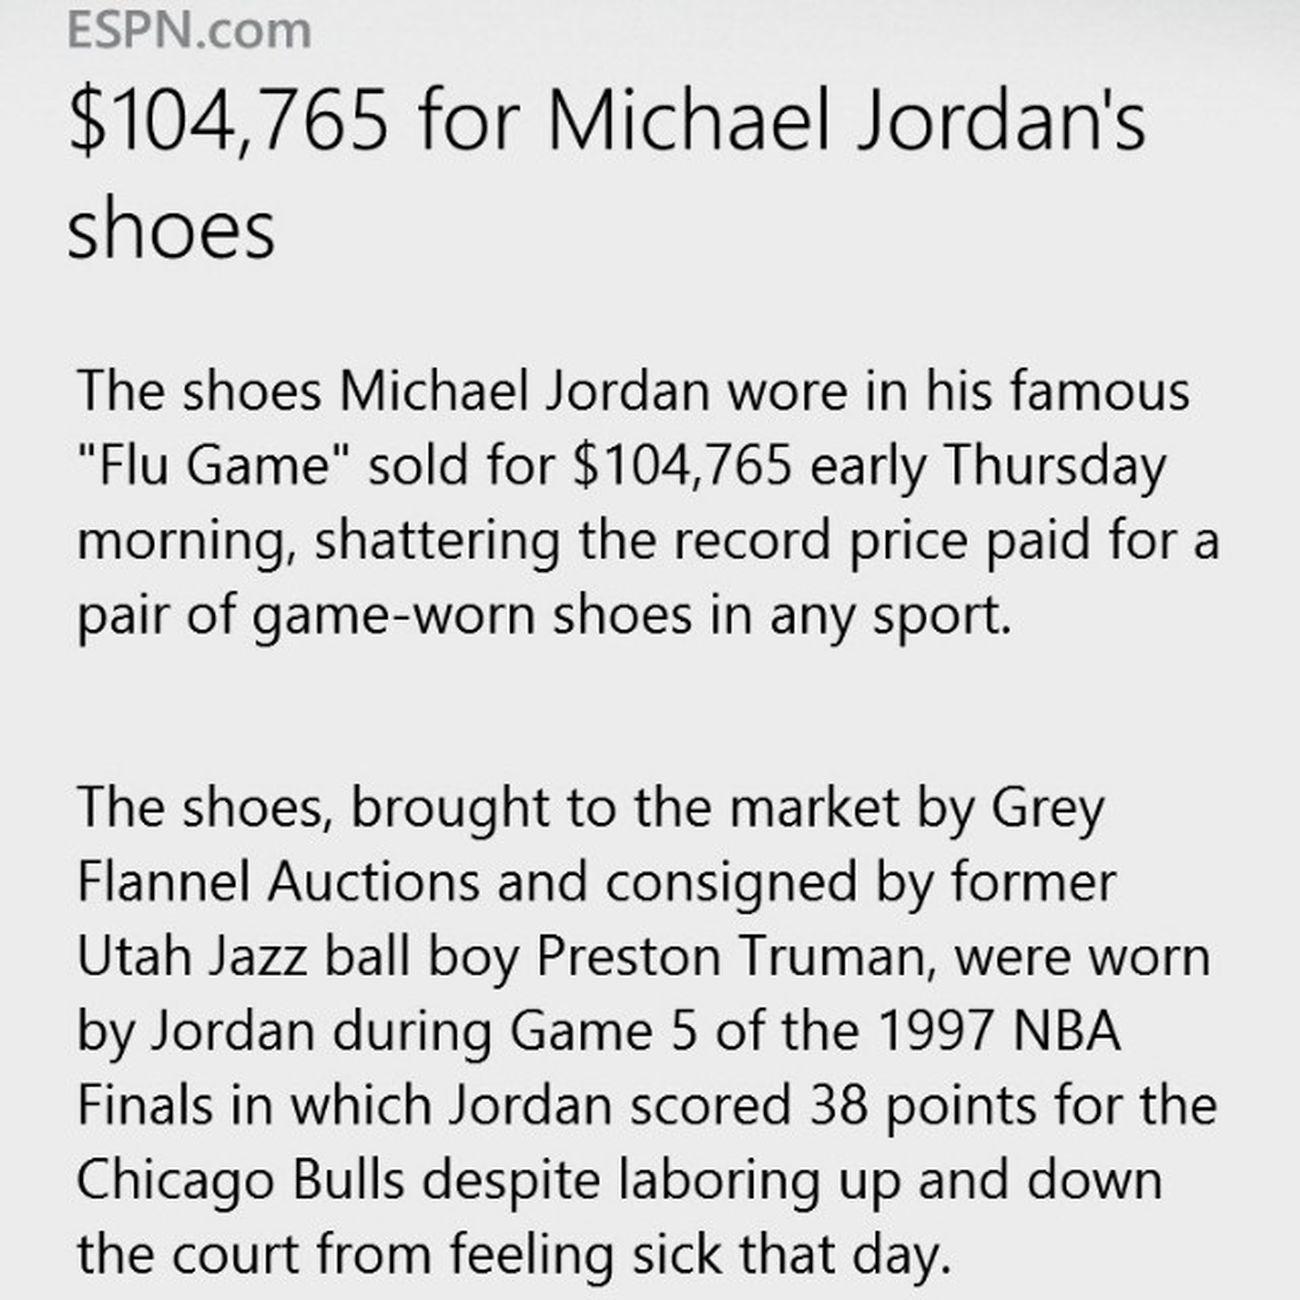 Yrflifestyle Mj Jordan Michaeljordan Chicago Bulls Flugame